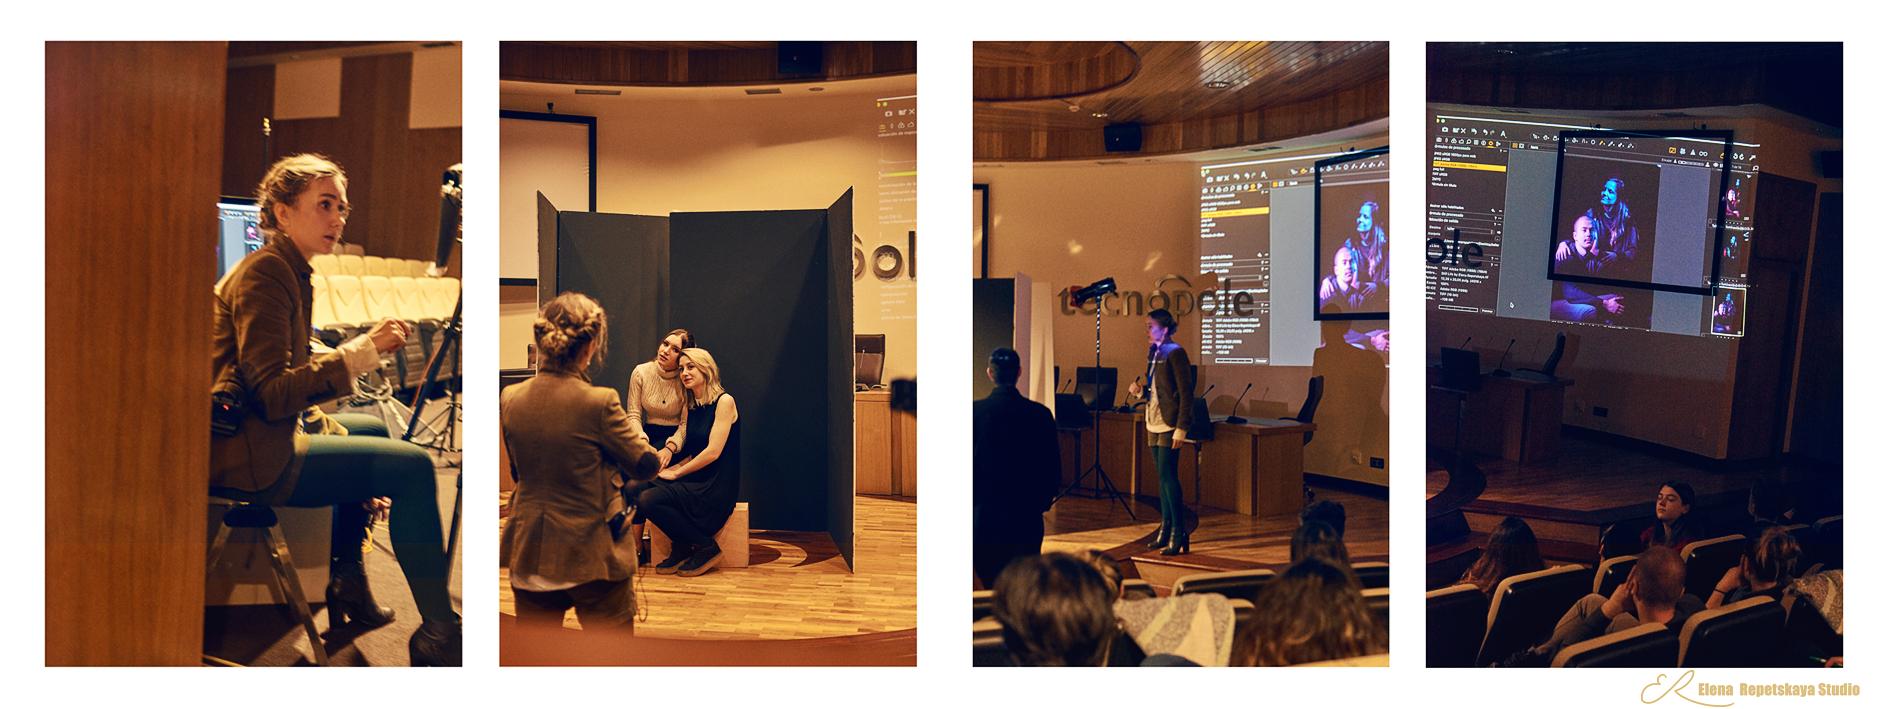 Workshop by Photographer Lena Repetskaya 4